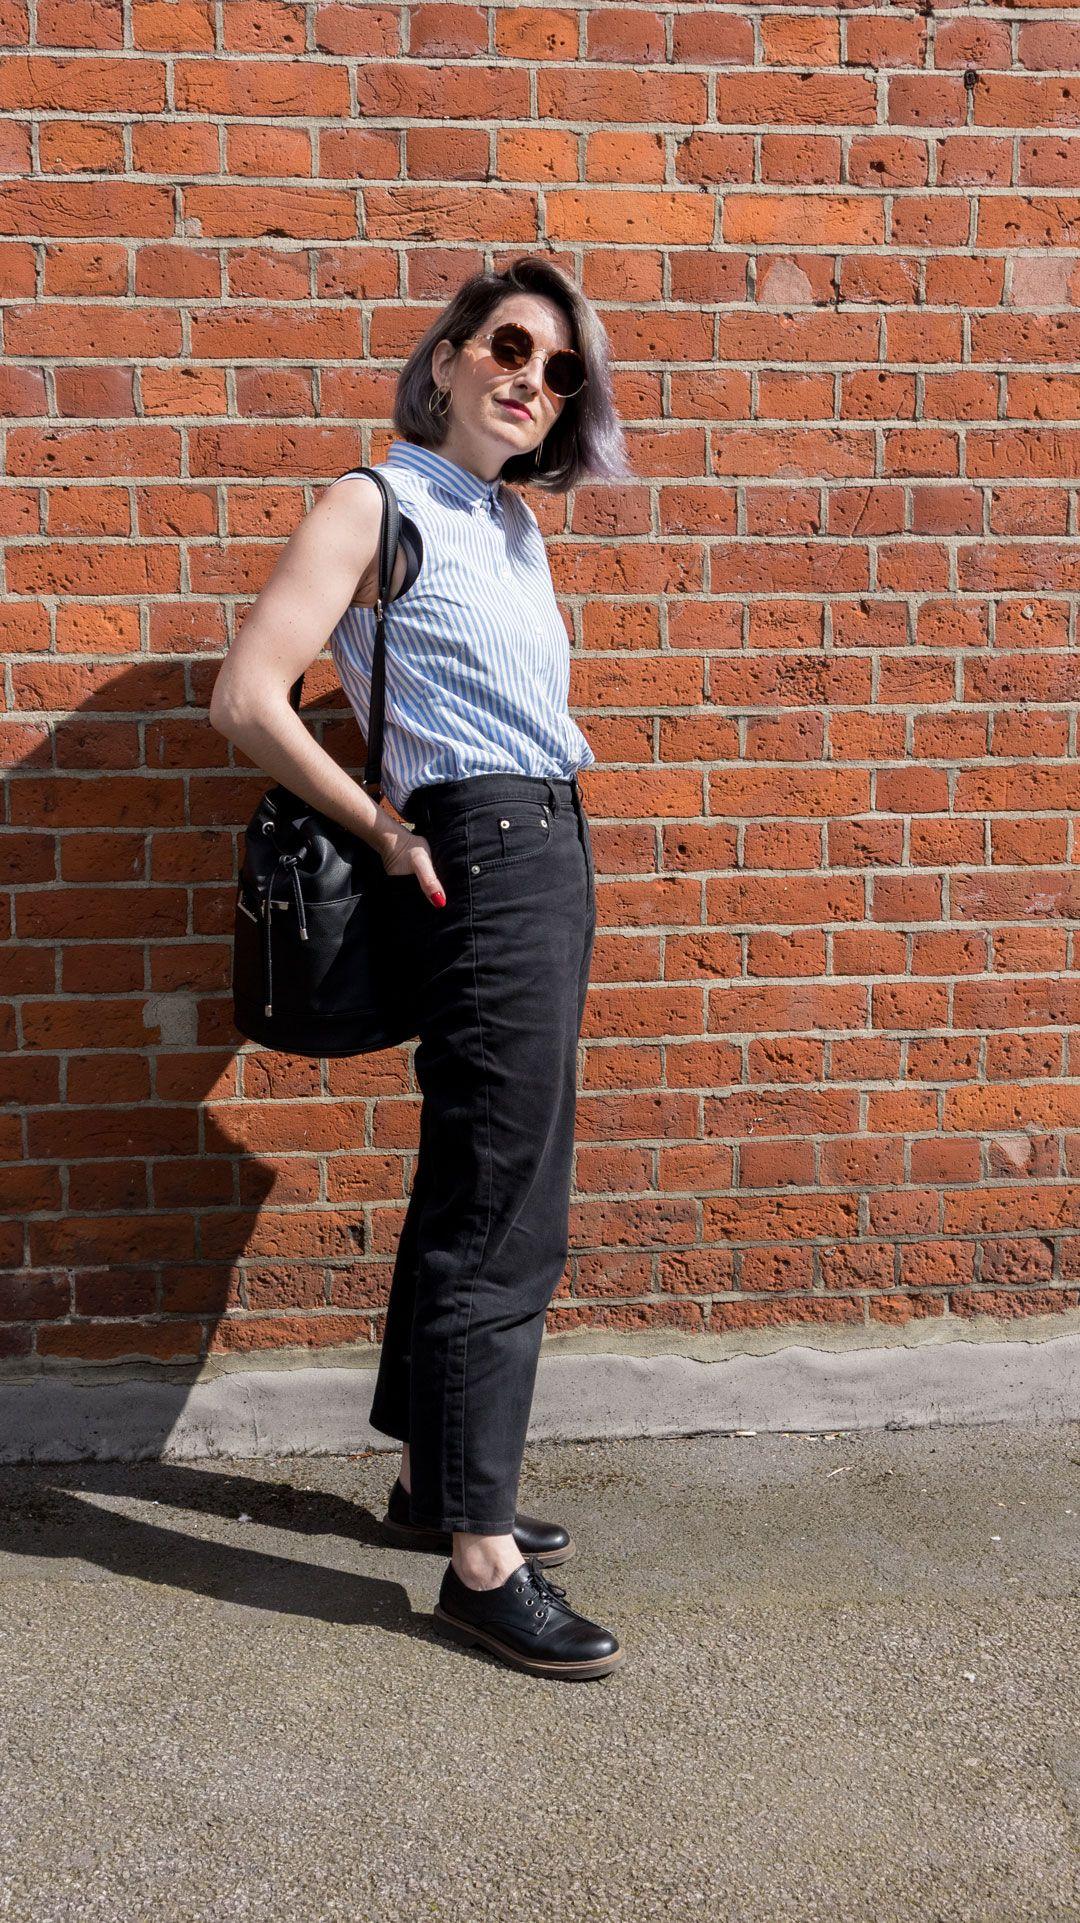 She talks Glam | Lawyer Striped sleeveless Shirt | High-rise Black Jeans | Shoreditch